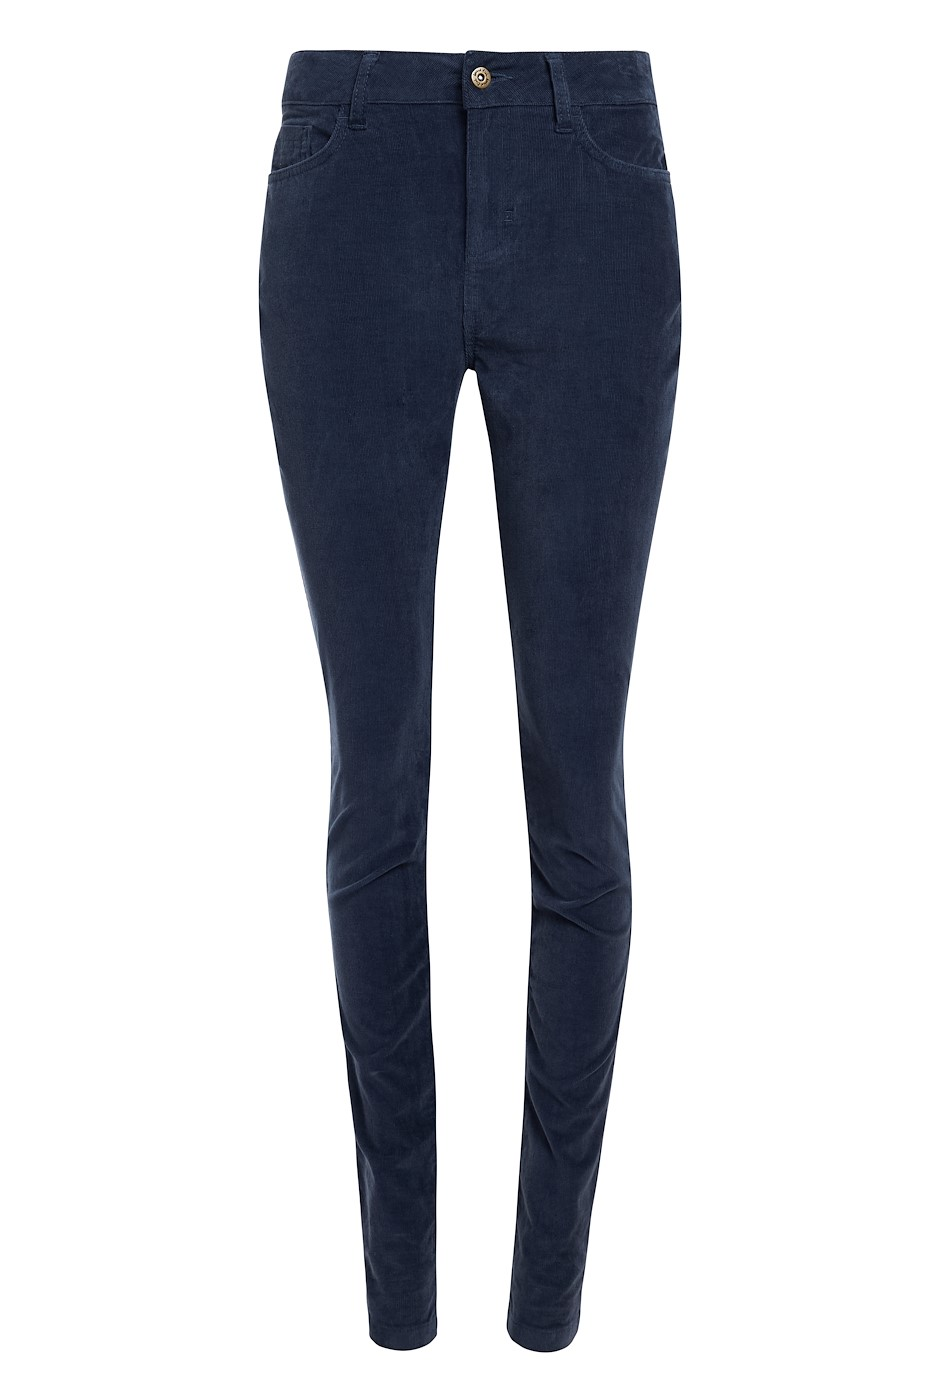 Destiny Cord Skinny Jeans Navy